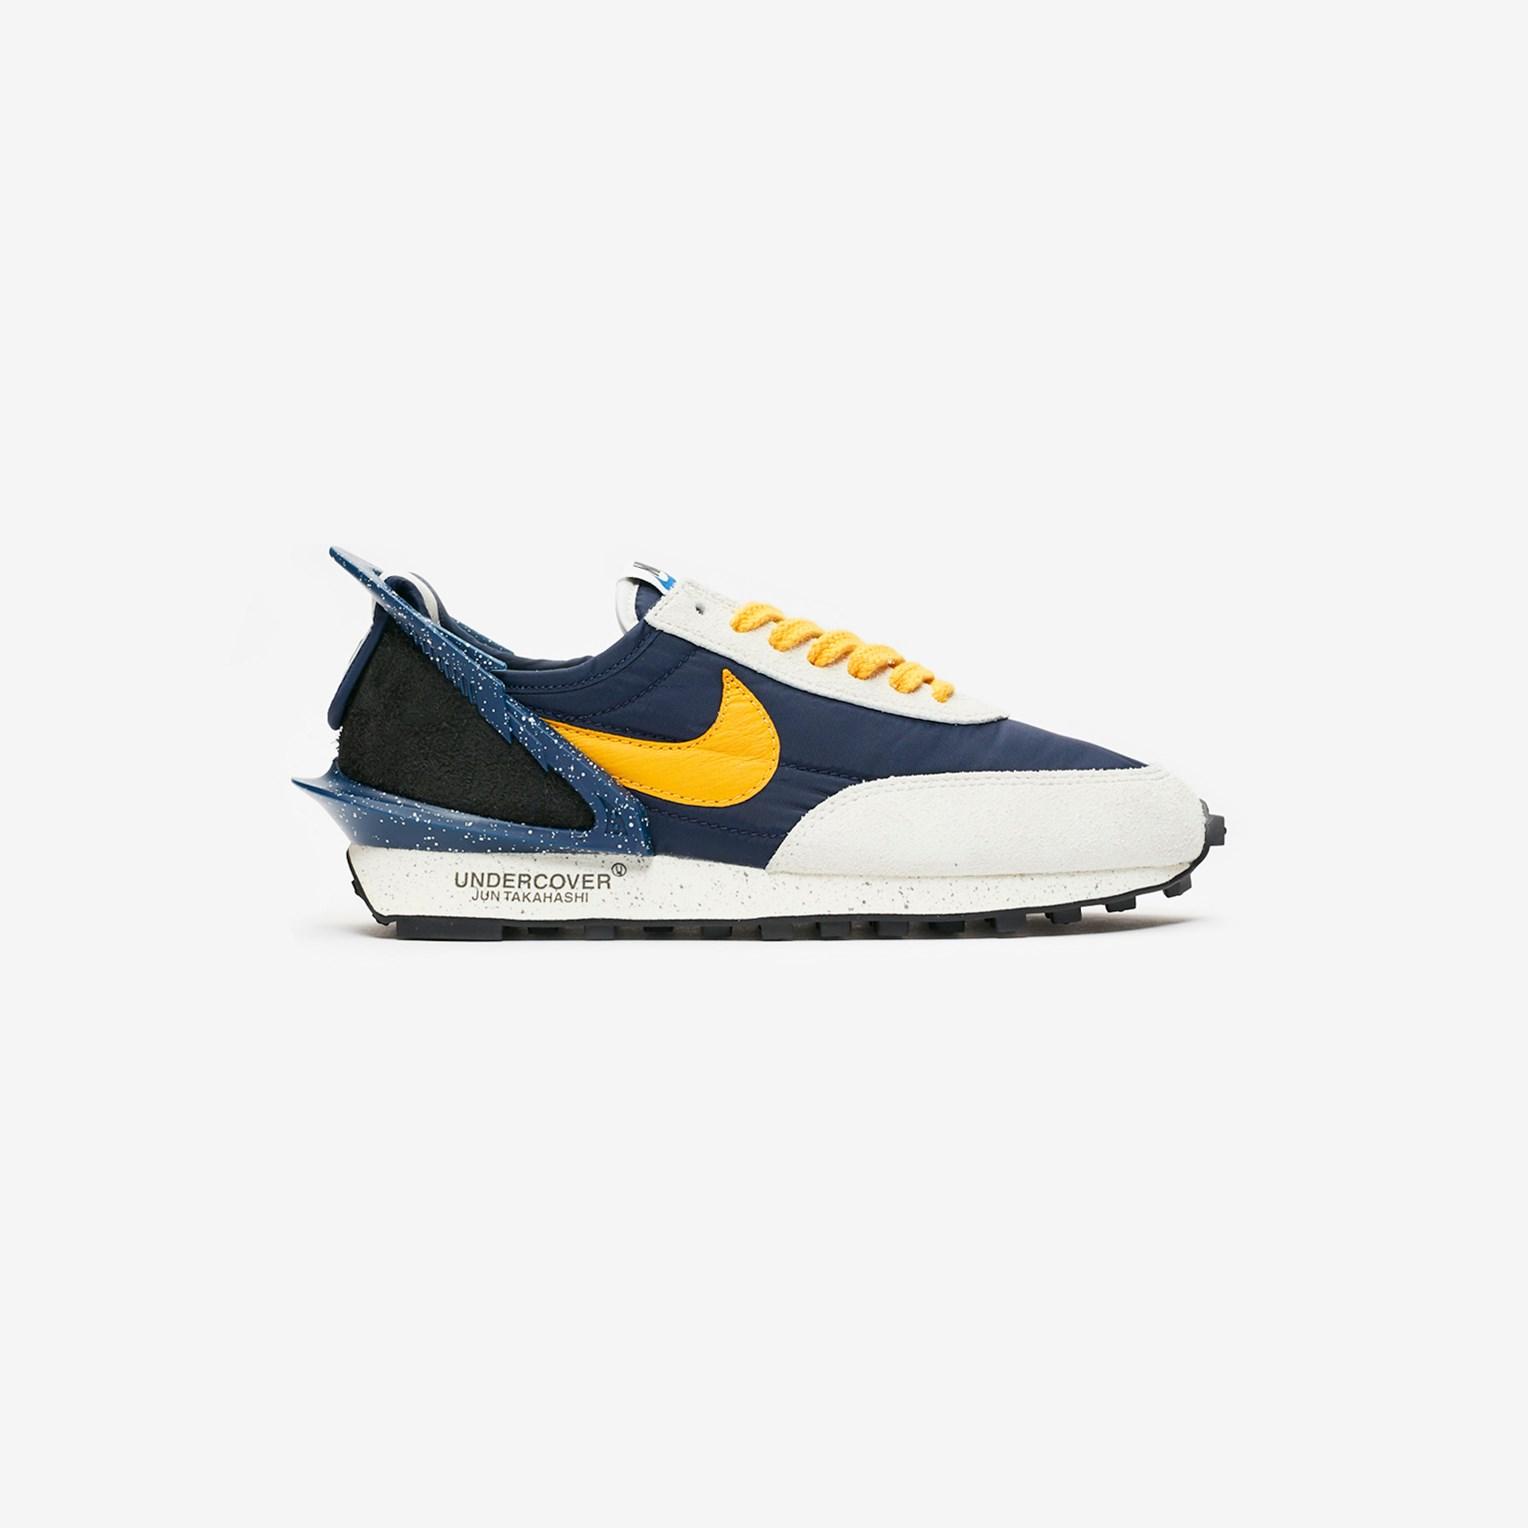 Jordan, Nike Lab and Reebok Launch